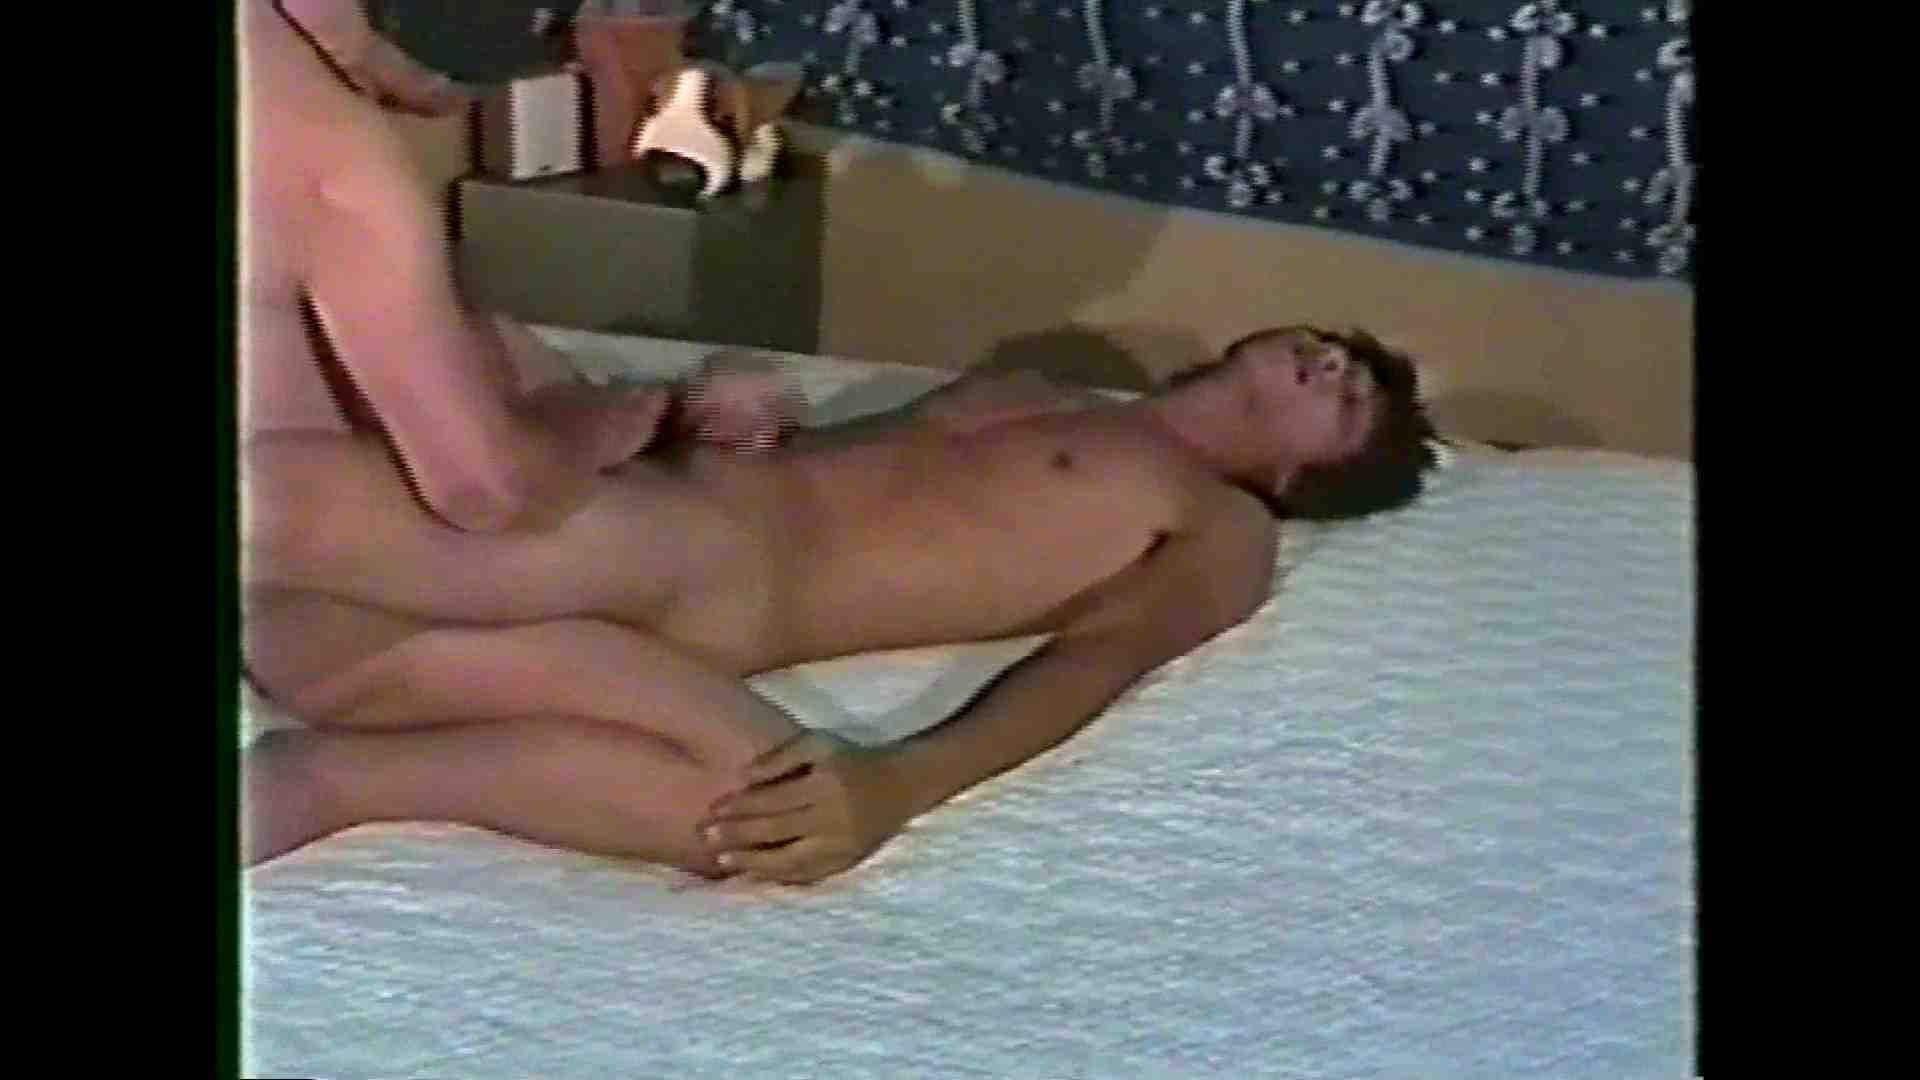 GAYBOY宏のオカズ倉庫Vol.3-4 ゲイのシックスナイン ゲイ無料エロ画像 91pic 38